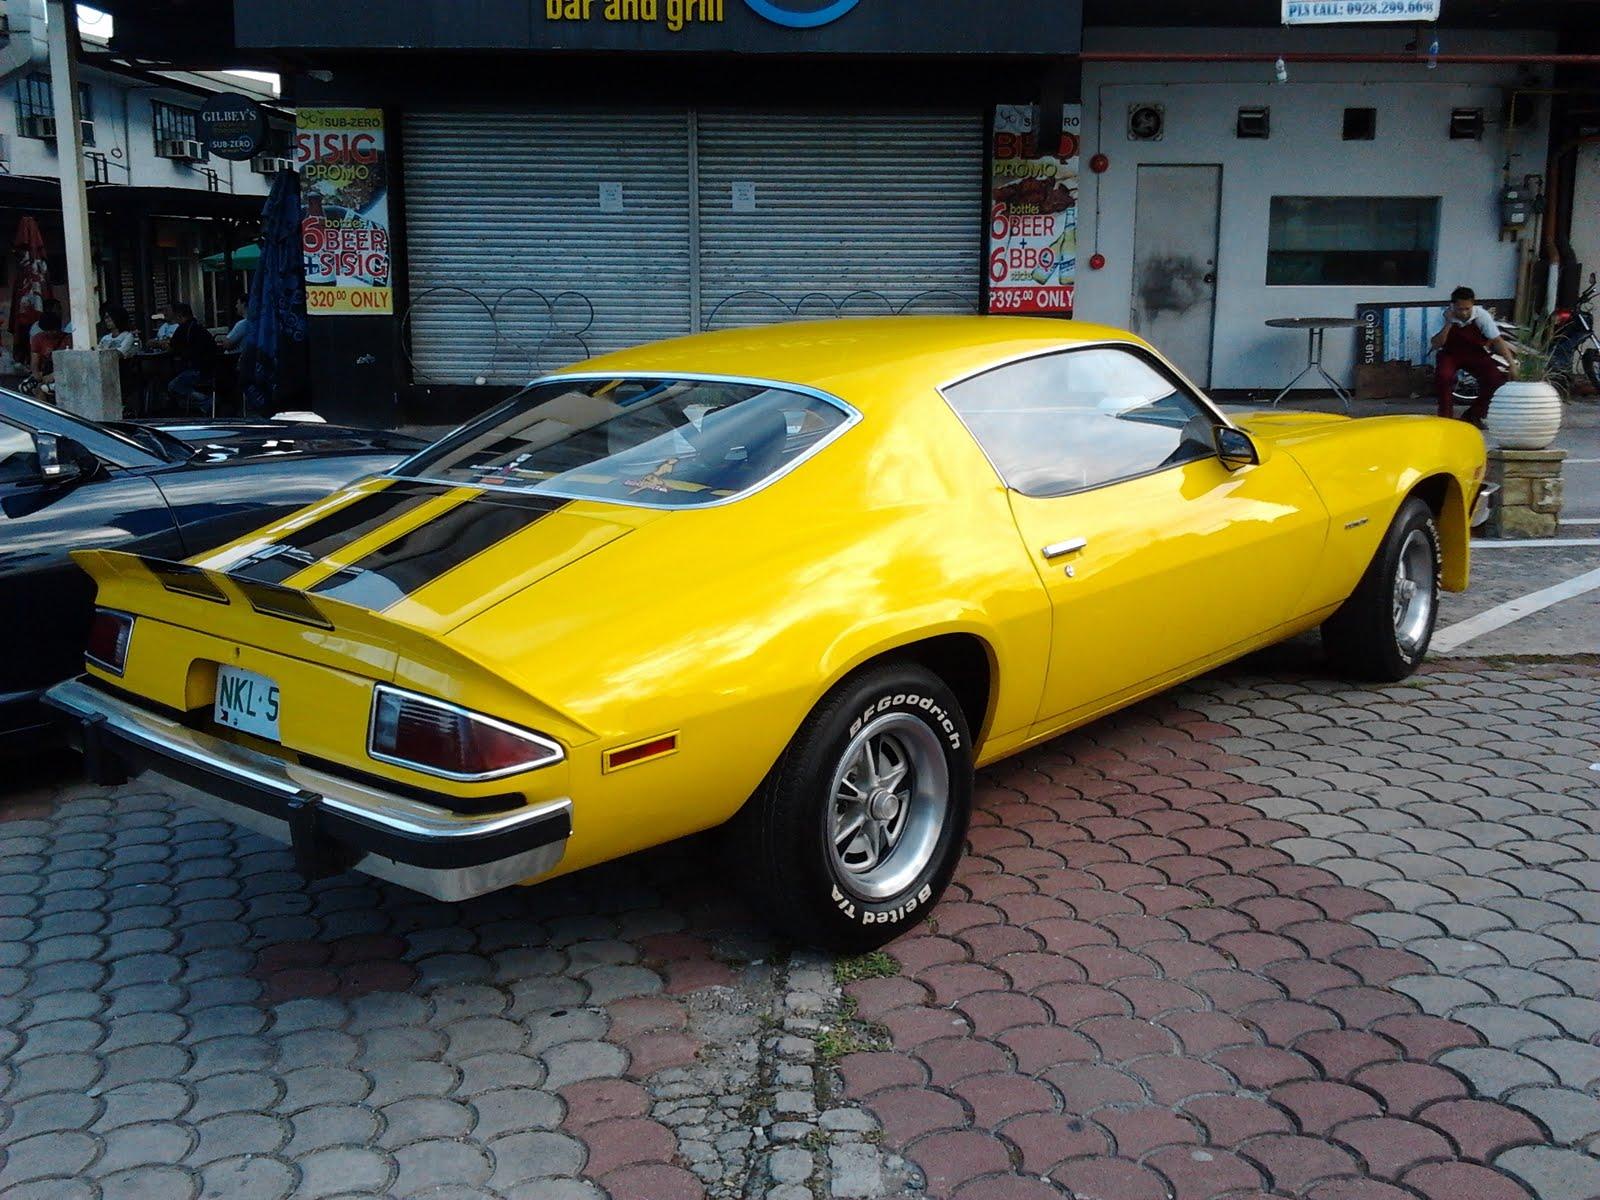 2006 Chevy Camaro >> Parked Cars Manila: 1977 Chevrolet Camaro